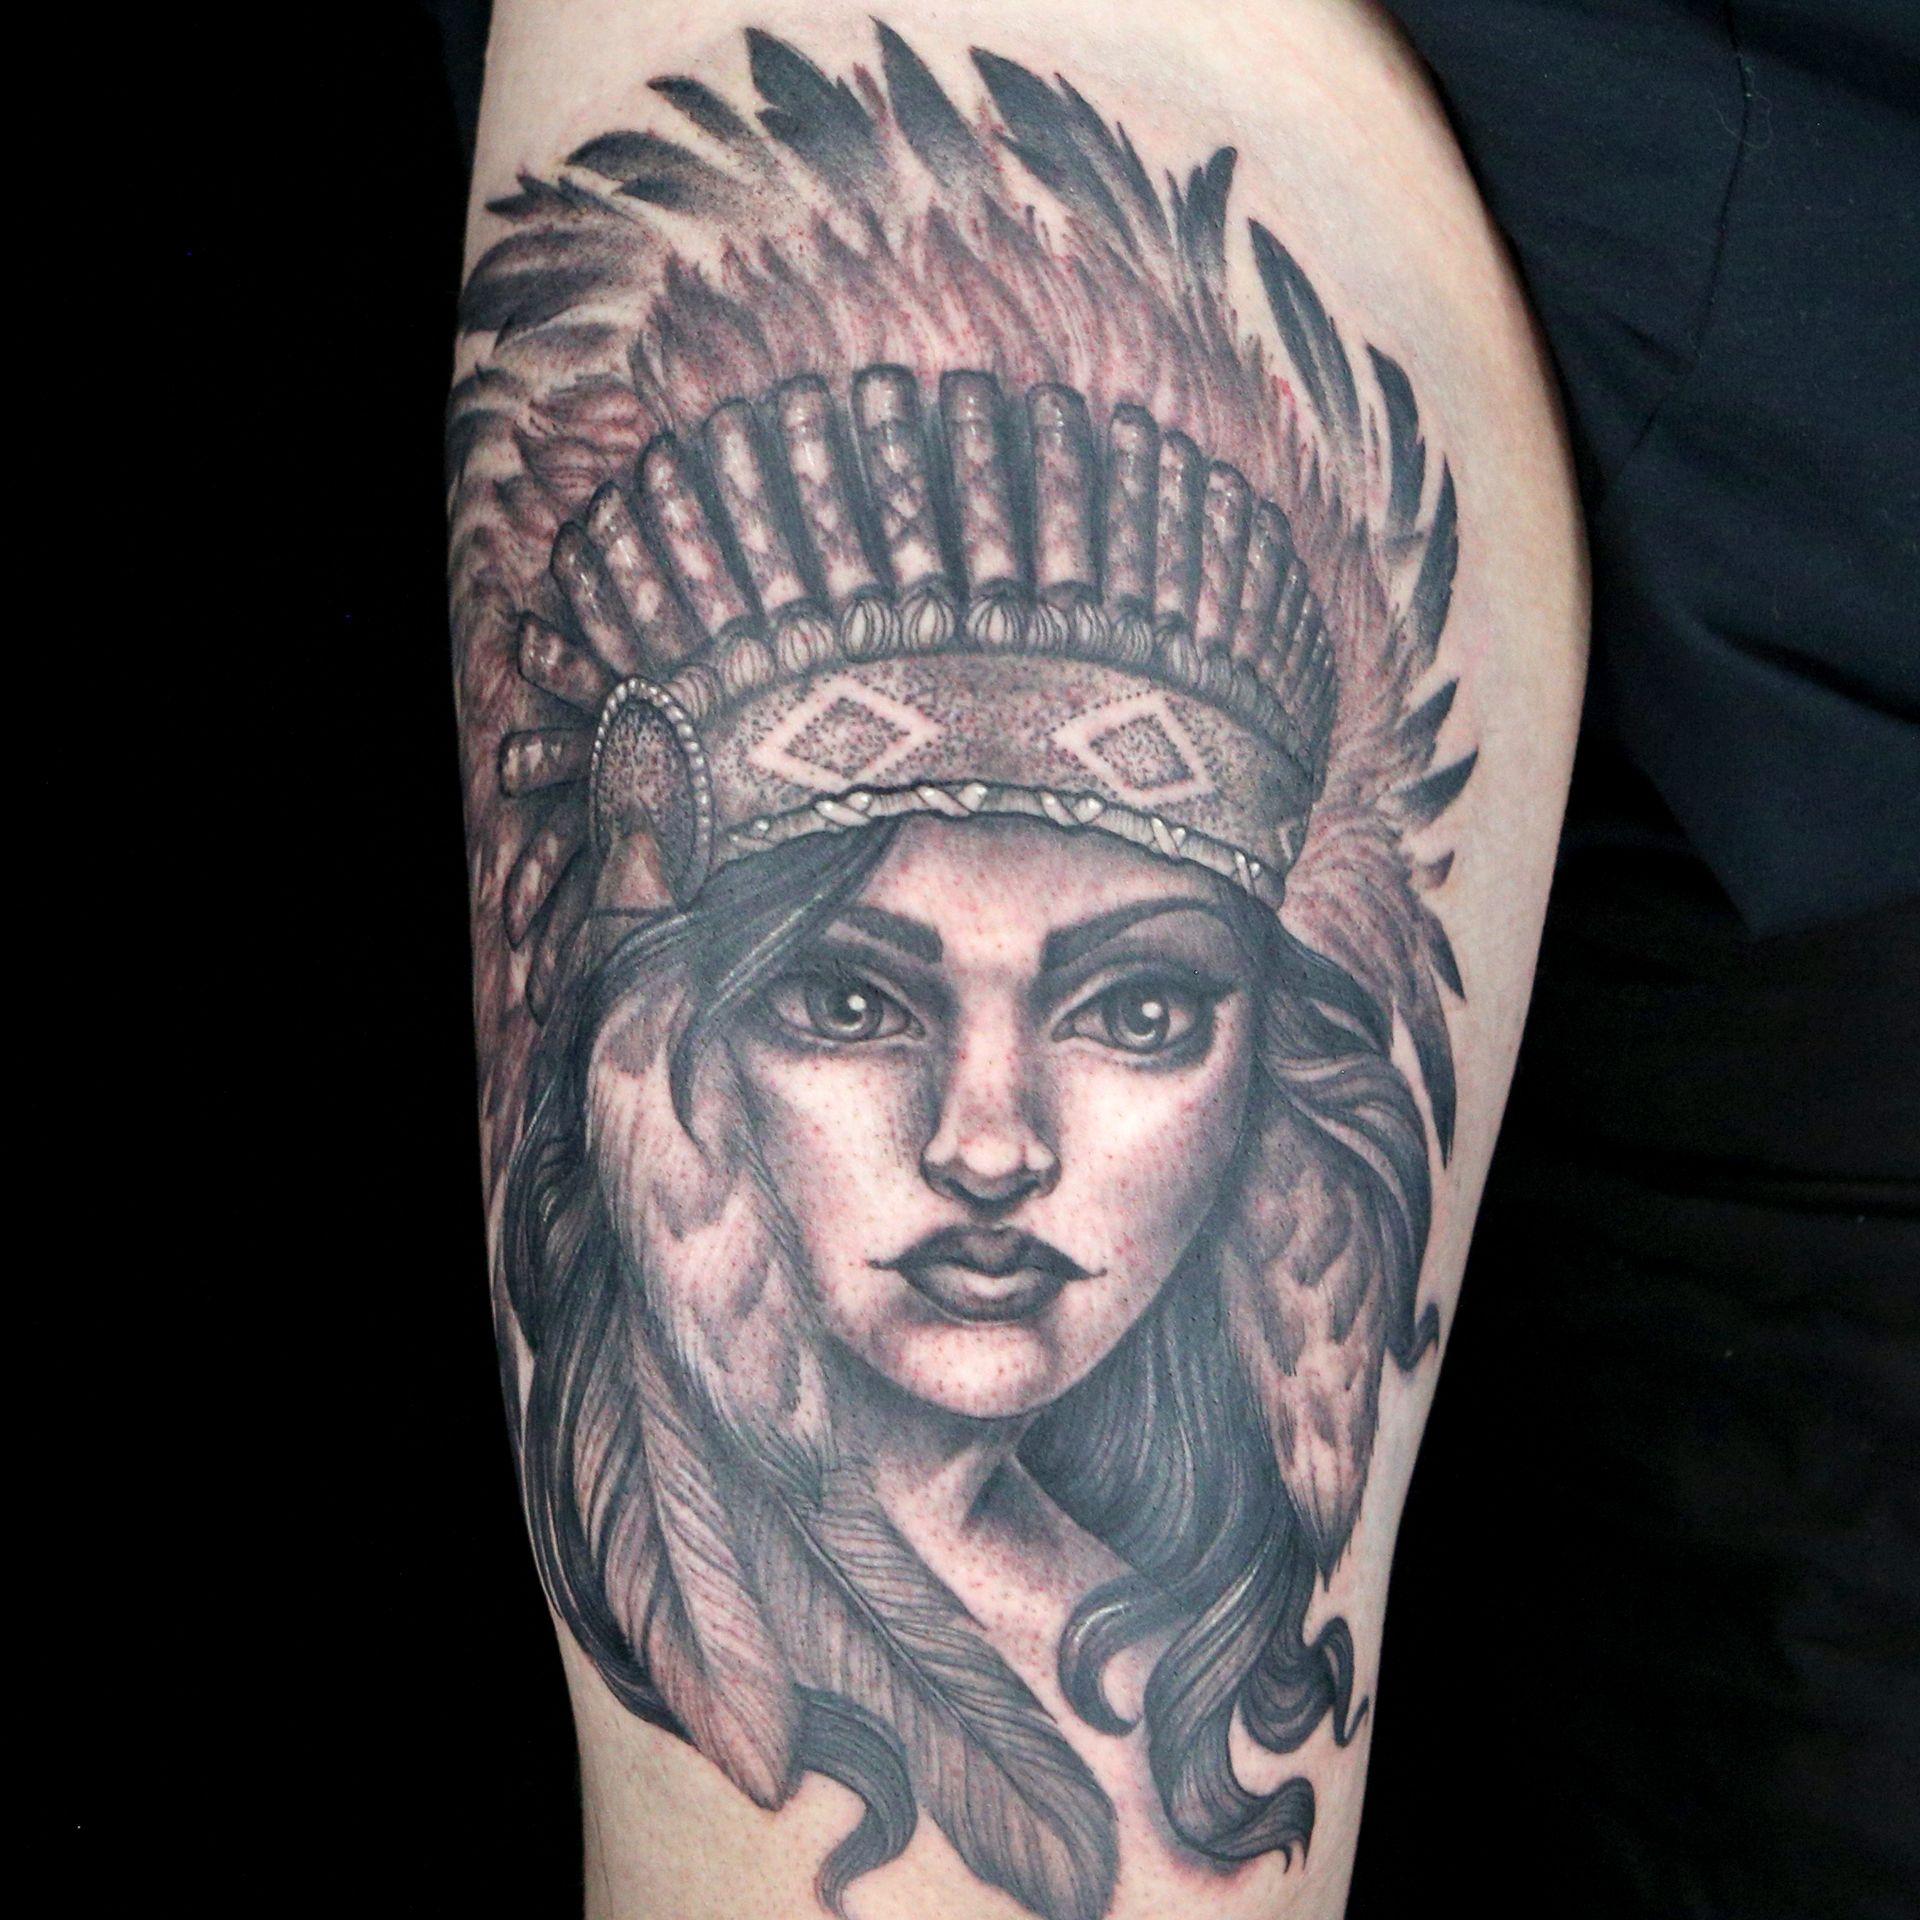 93c9bdb36 Native American Tattoo by Artistic Skin Designs (April Nicole & Dane Smith)